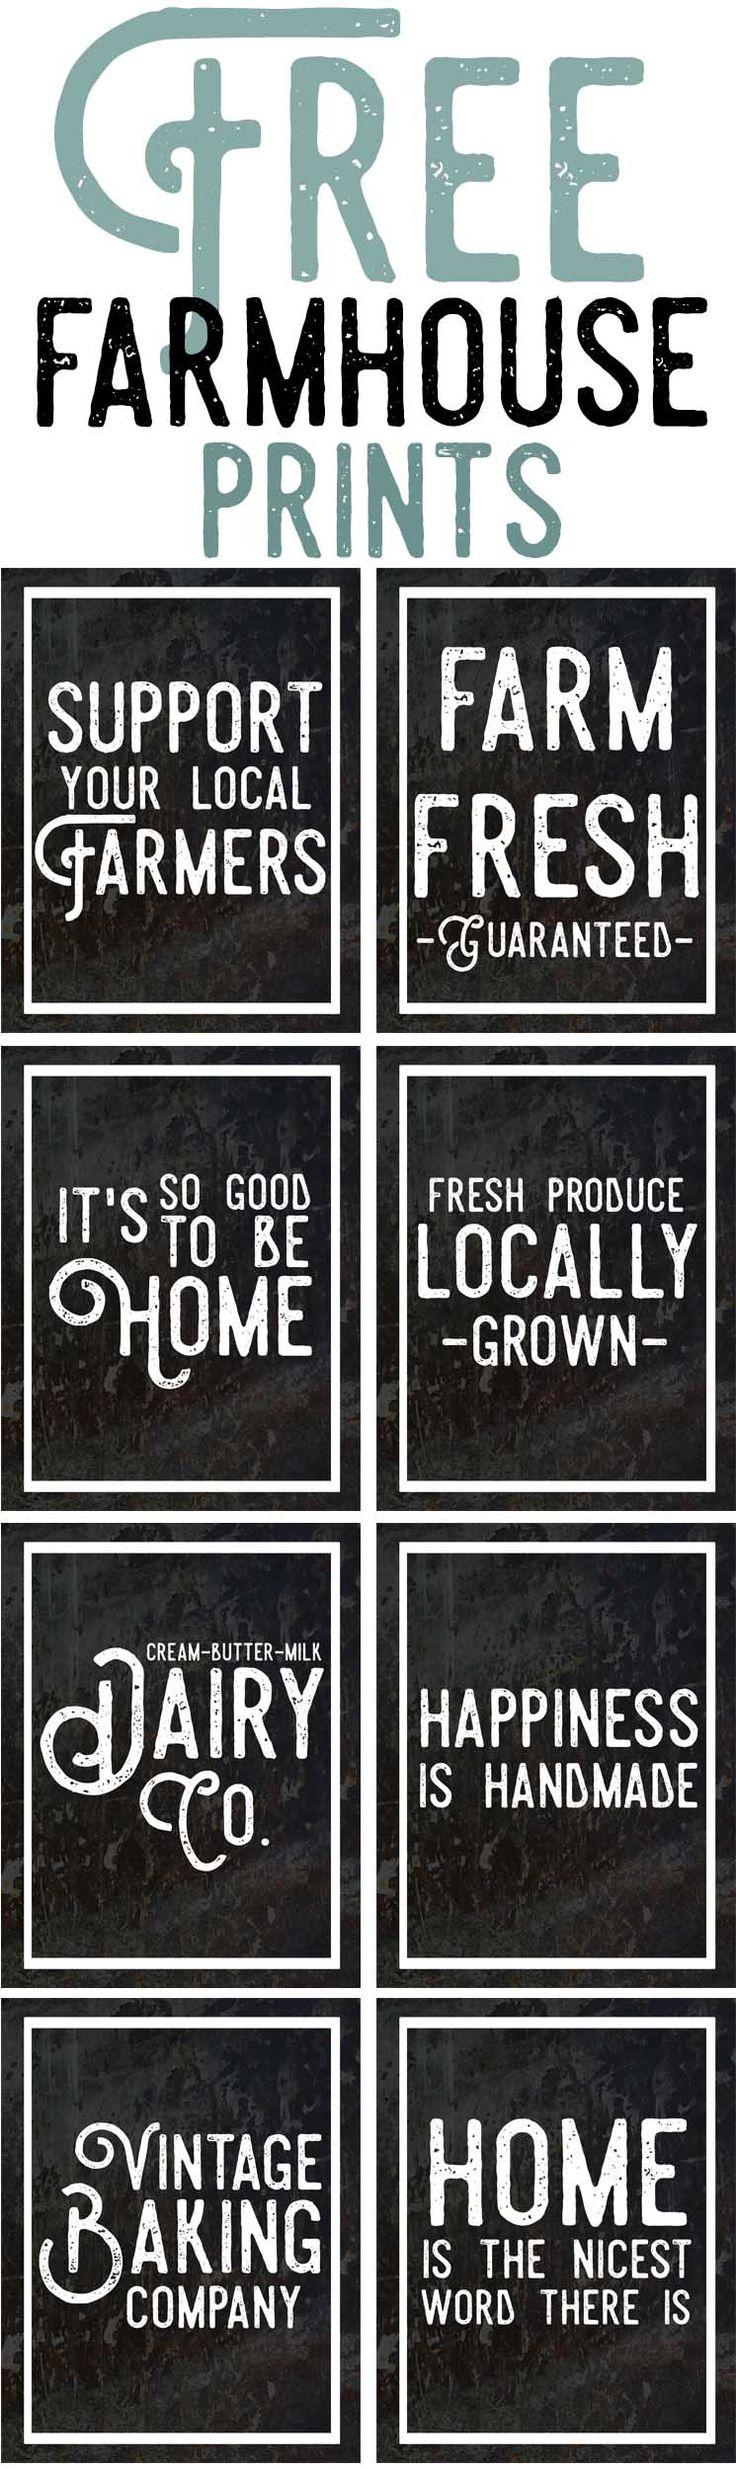 Free Farmhouse Inspired Prints-Vintage Farm and Farmhouse Style Printables-farmhouse decor ideas.jpg